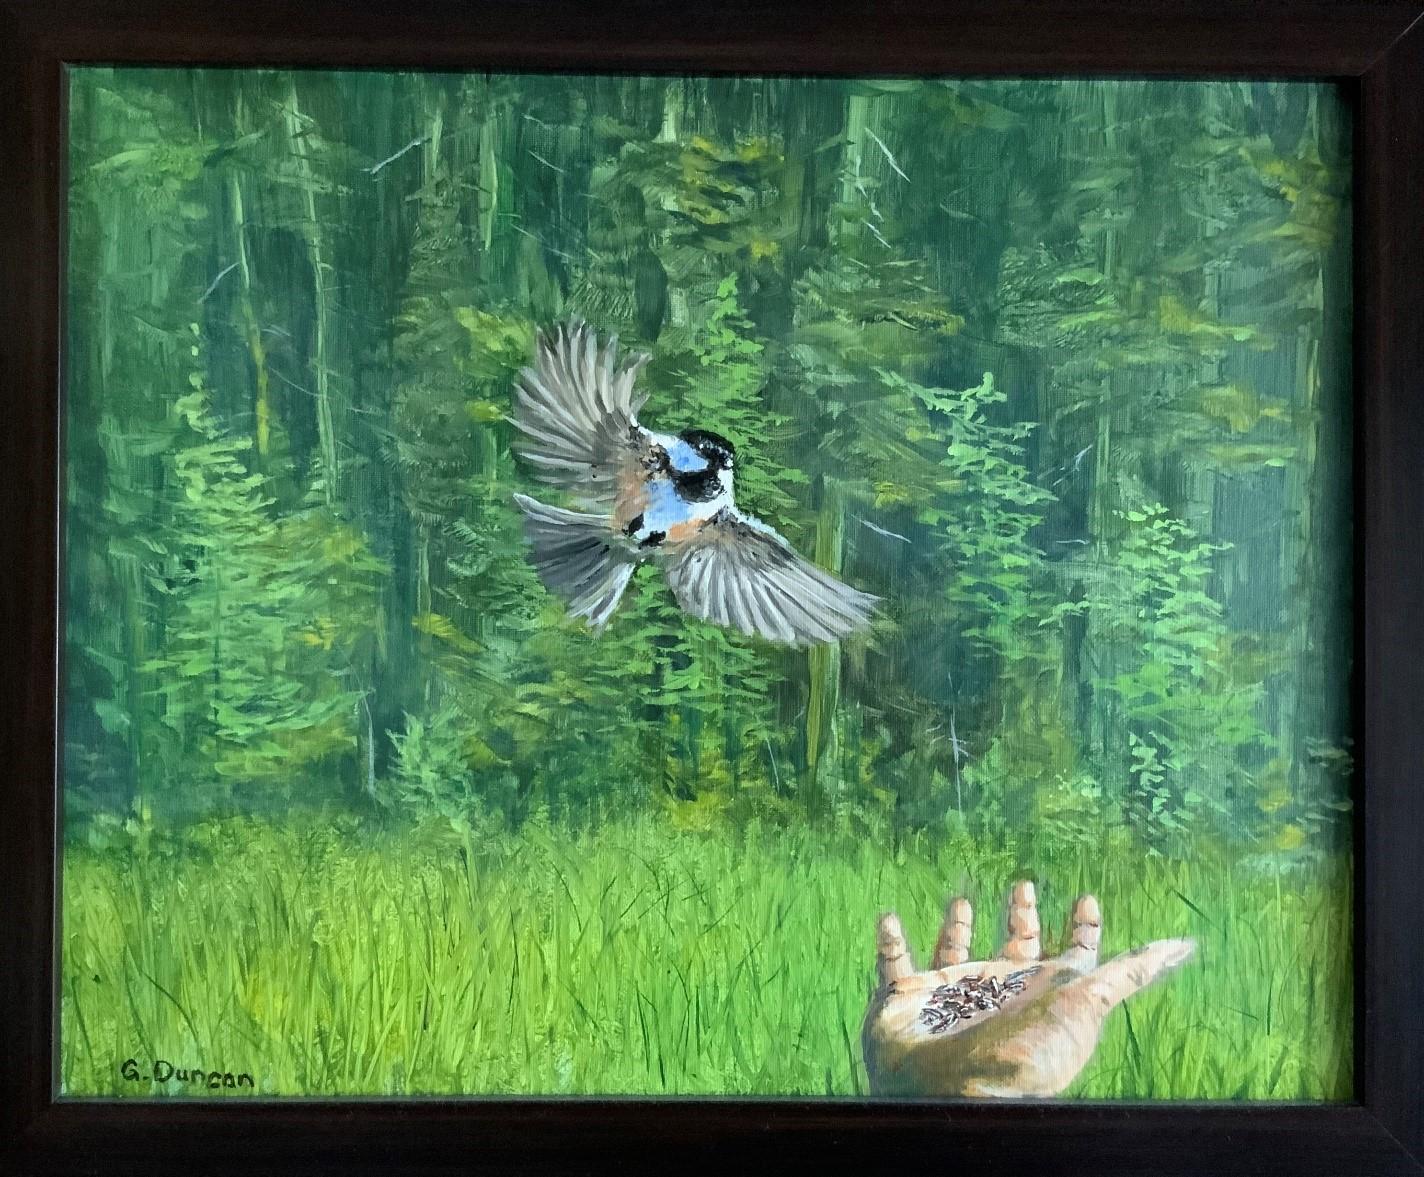 """Chickadee!"" by Gordon Duncan, 16"" x 20"" oil on canvas"